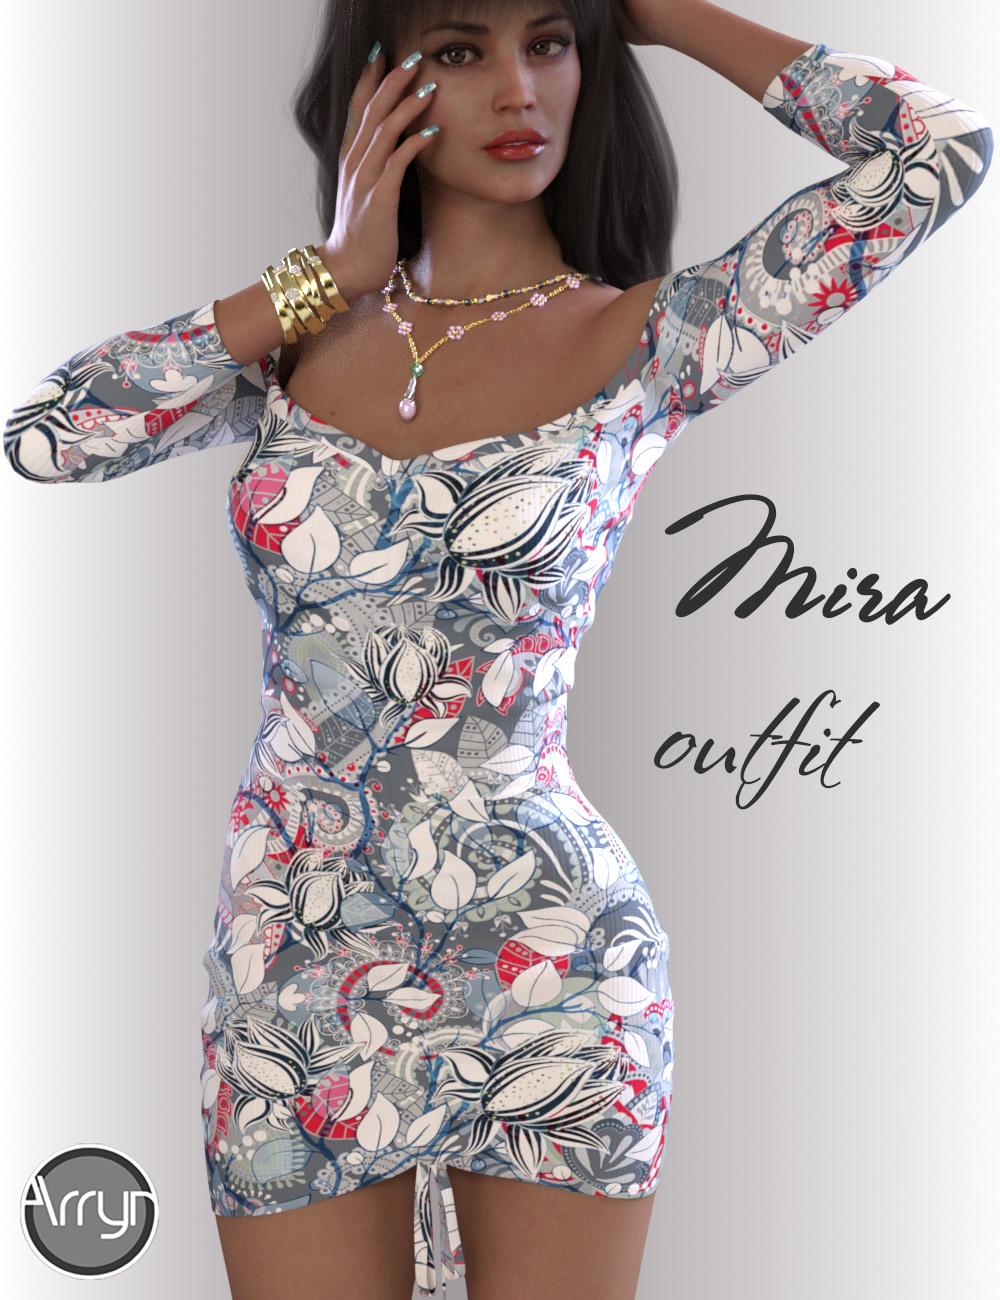 dForce Mira Outfit for Genesis 8.1 Females by: OnnelArryn, 3D Models by Daz 3D